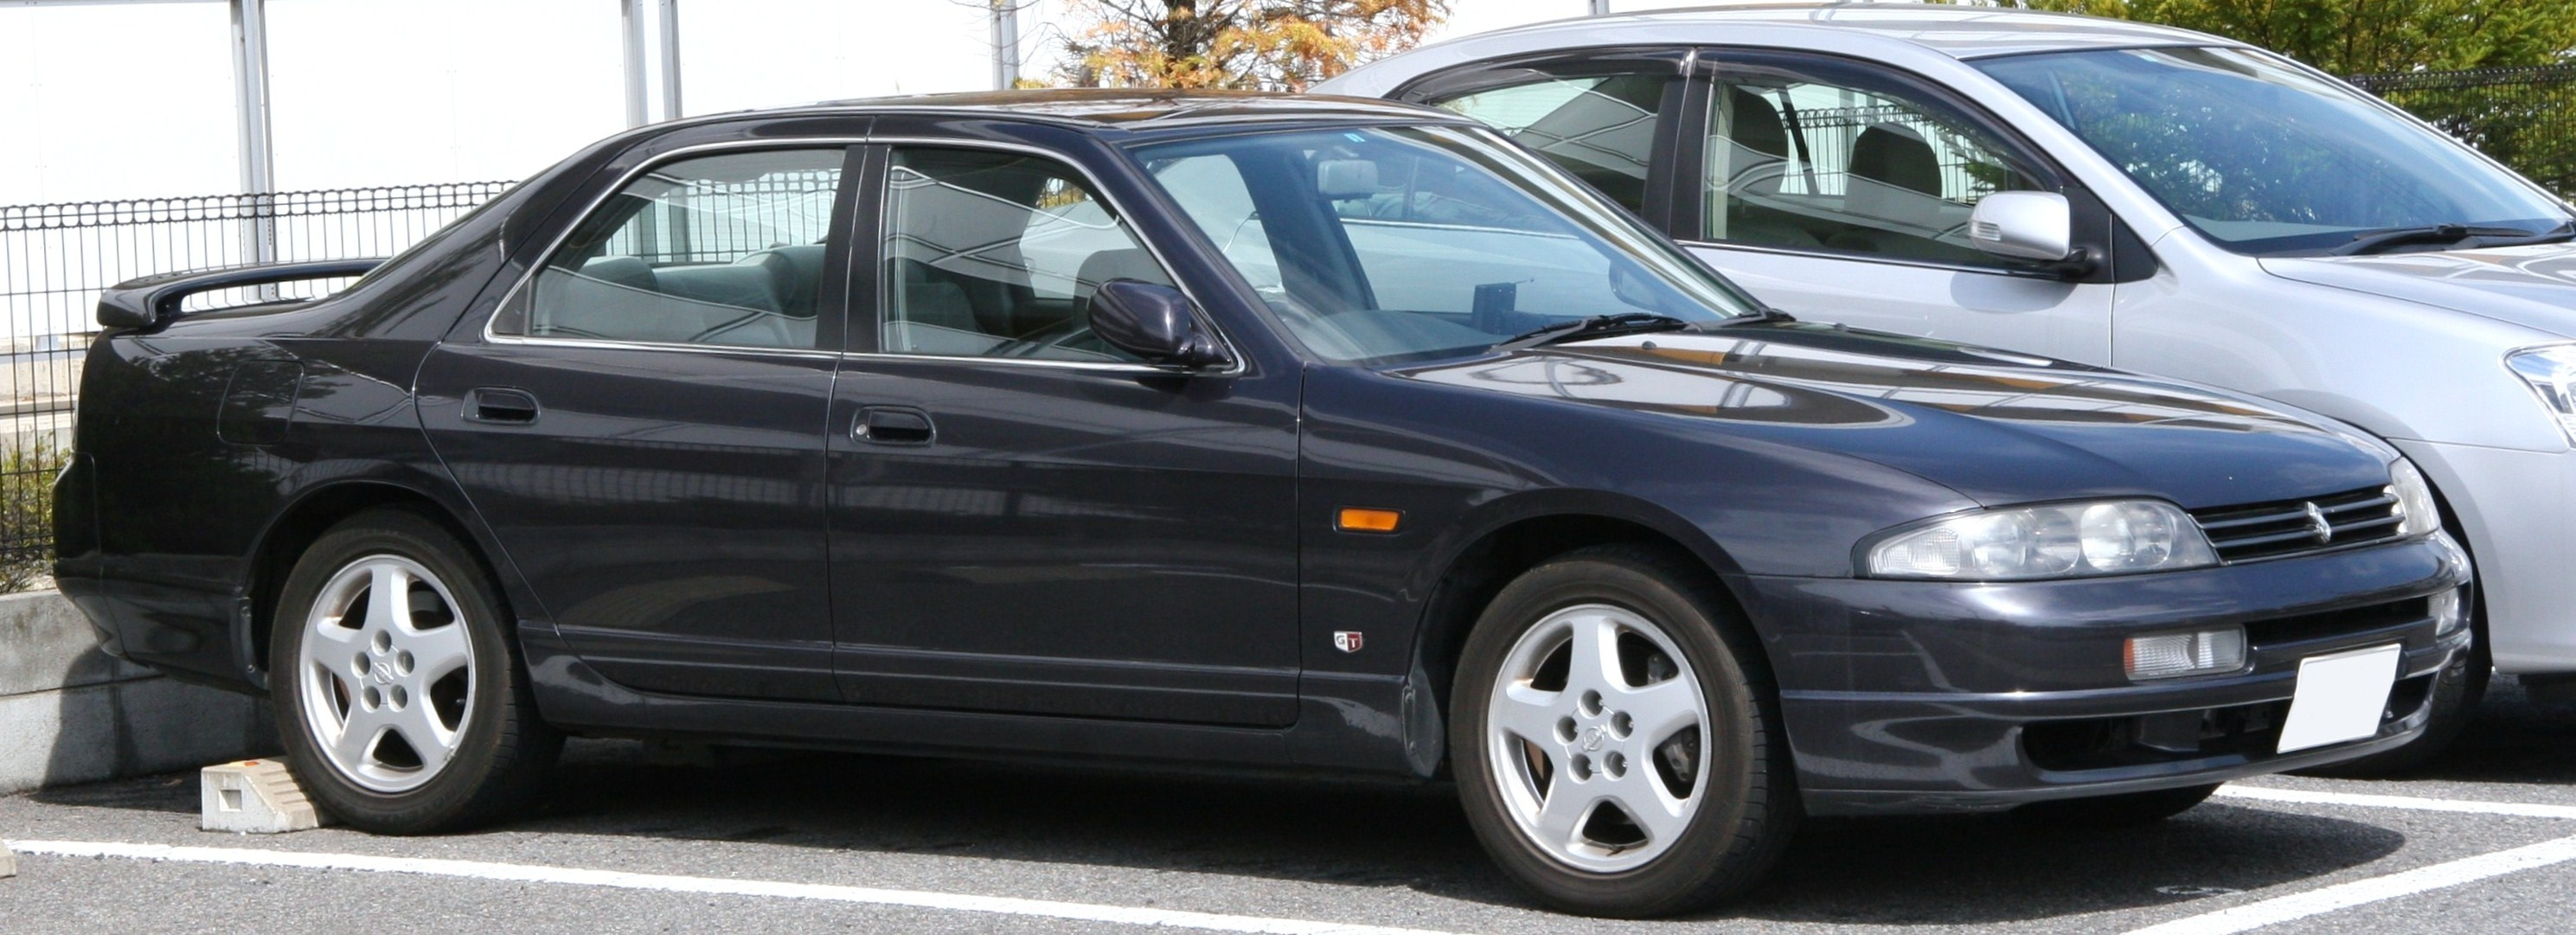 Nissan Skyline IX (R33) 1993 - 1998 Sedan #2